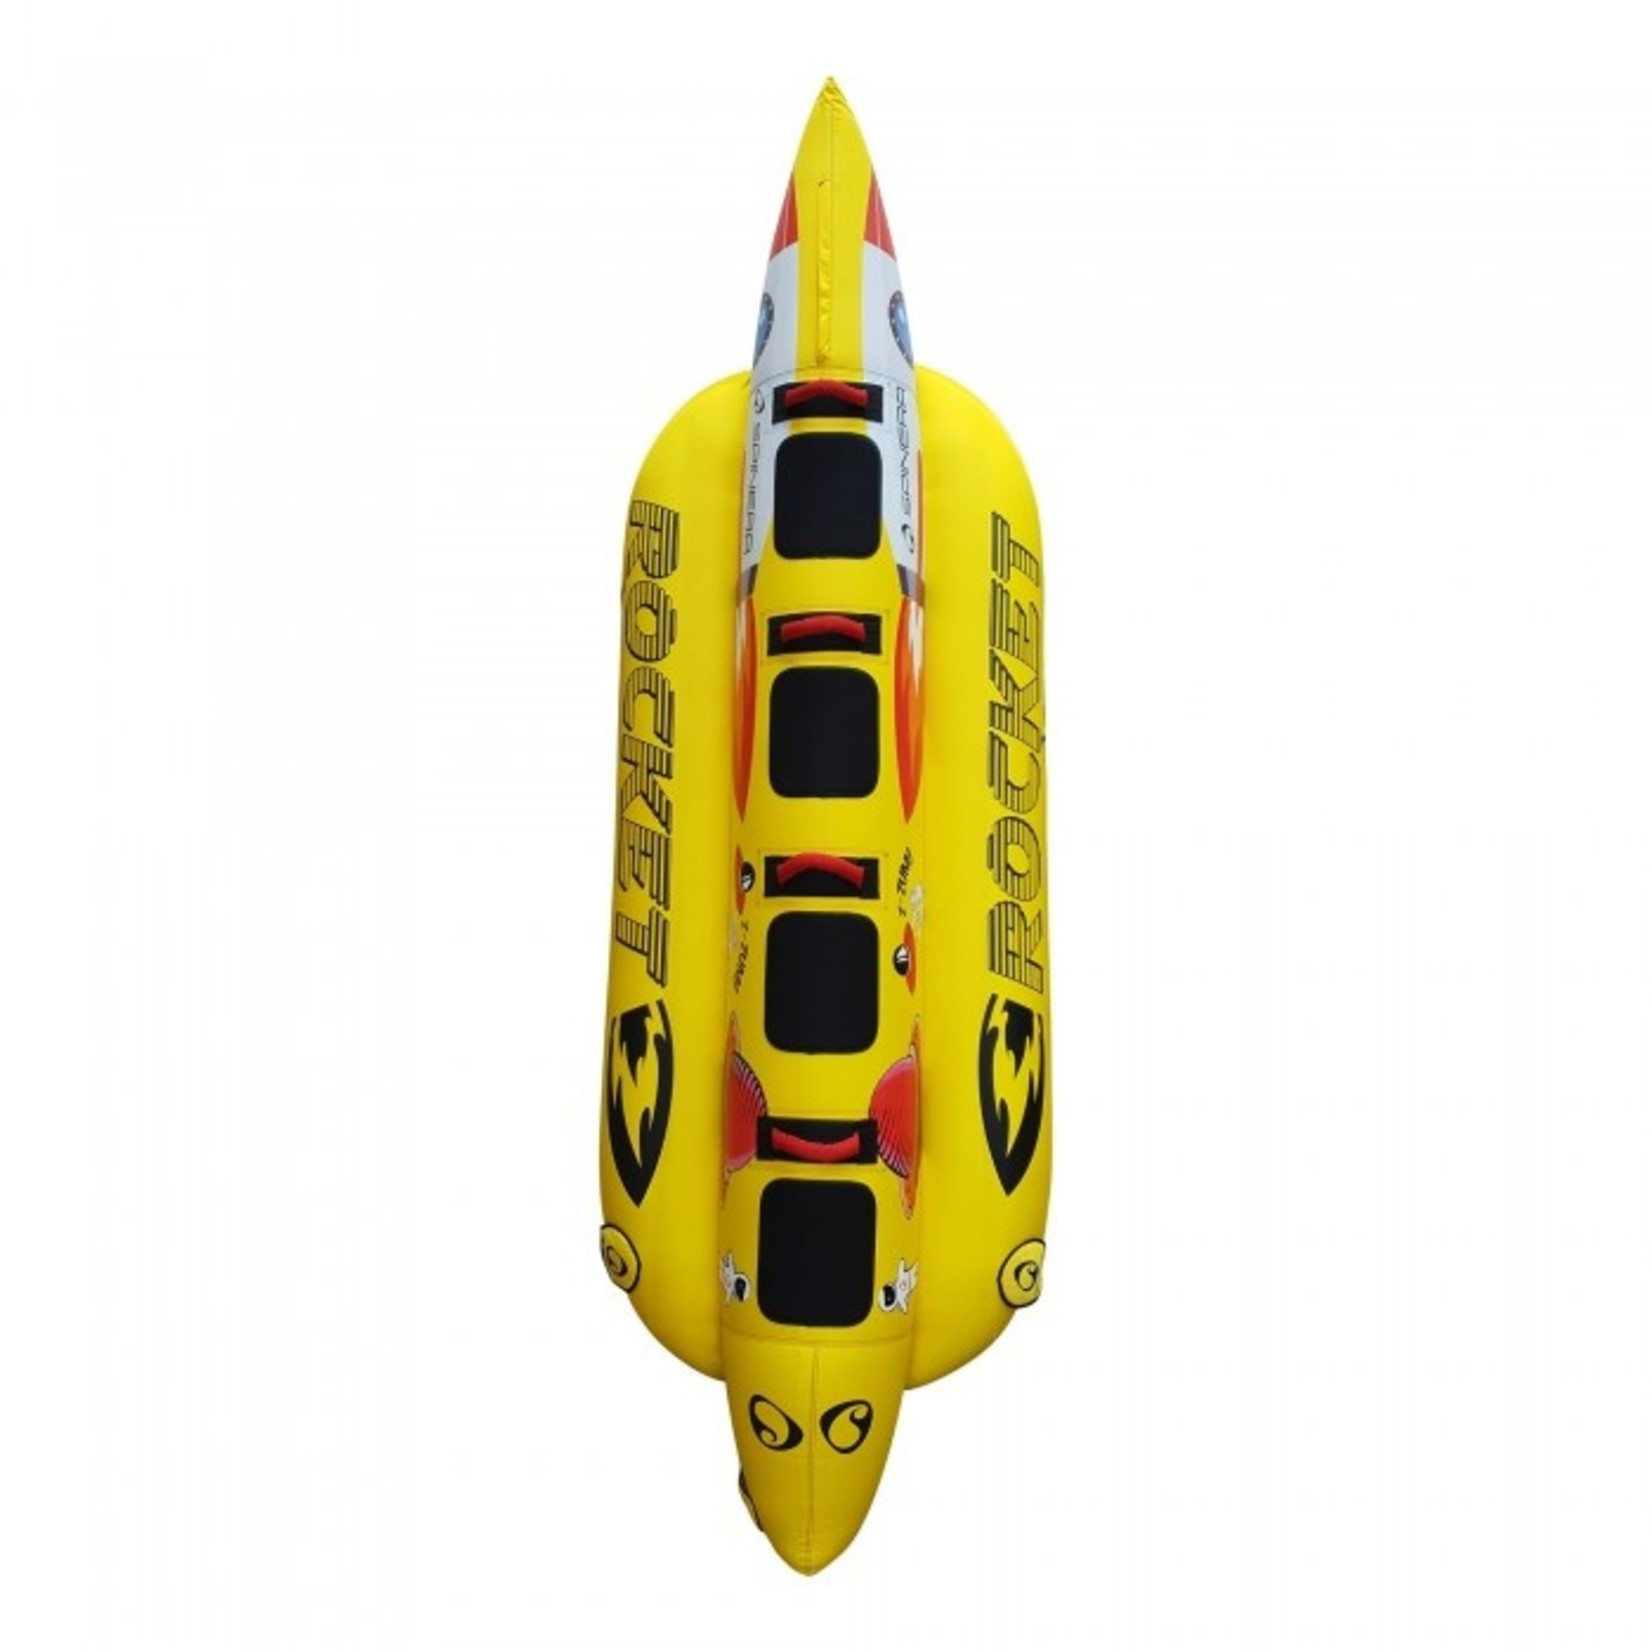 Rocket 4 - Quadruple Banana